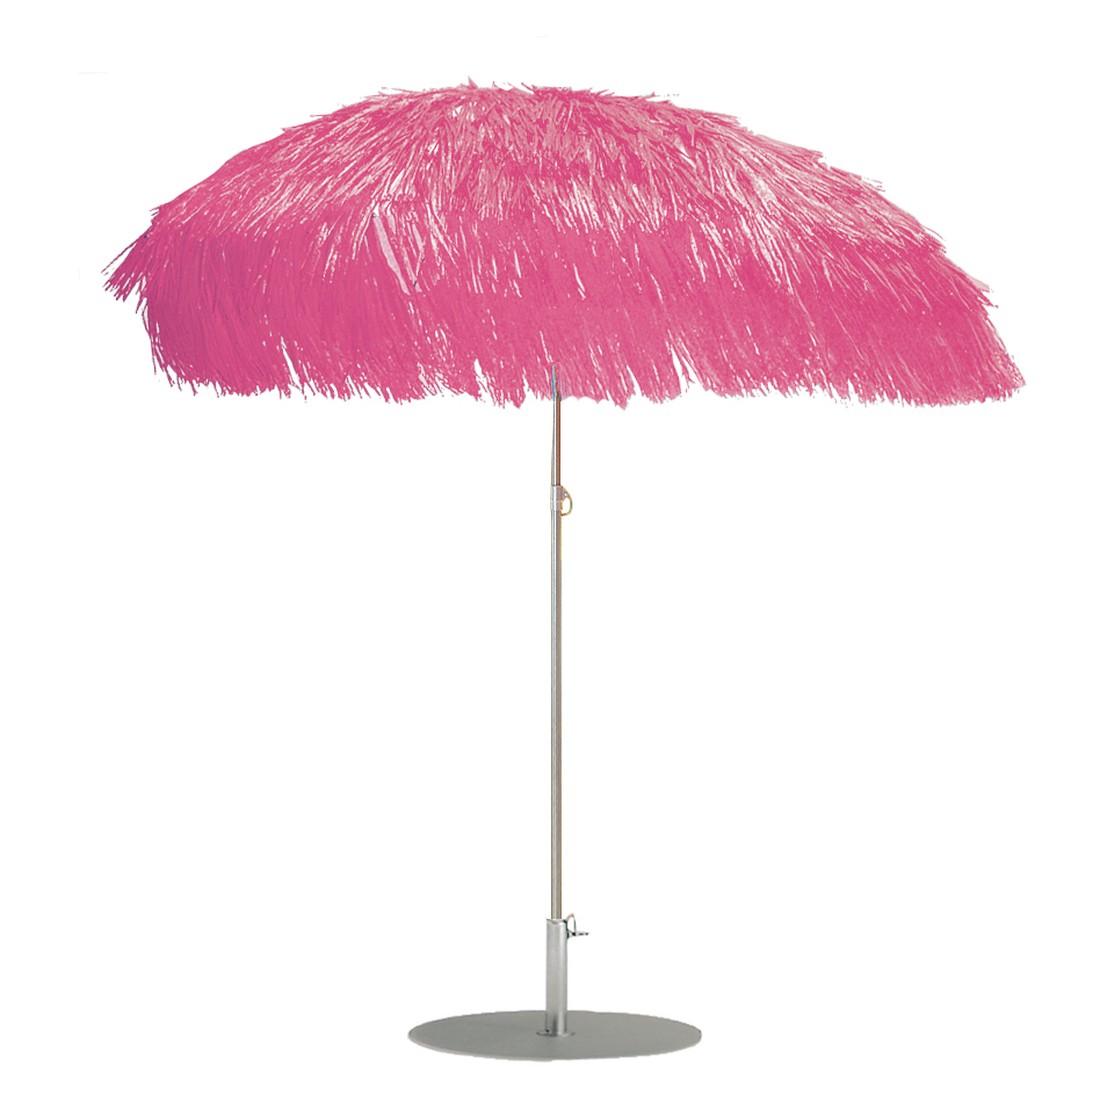 sonnenschirm hawaii mit knickgelenk stahlrohr pink jan kurtz jetzt bestellen. Black Bedroom Furniture Sets. Home Design Ideas